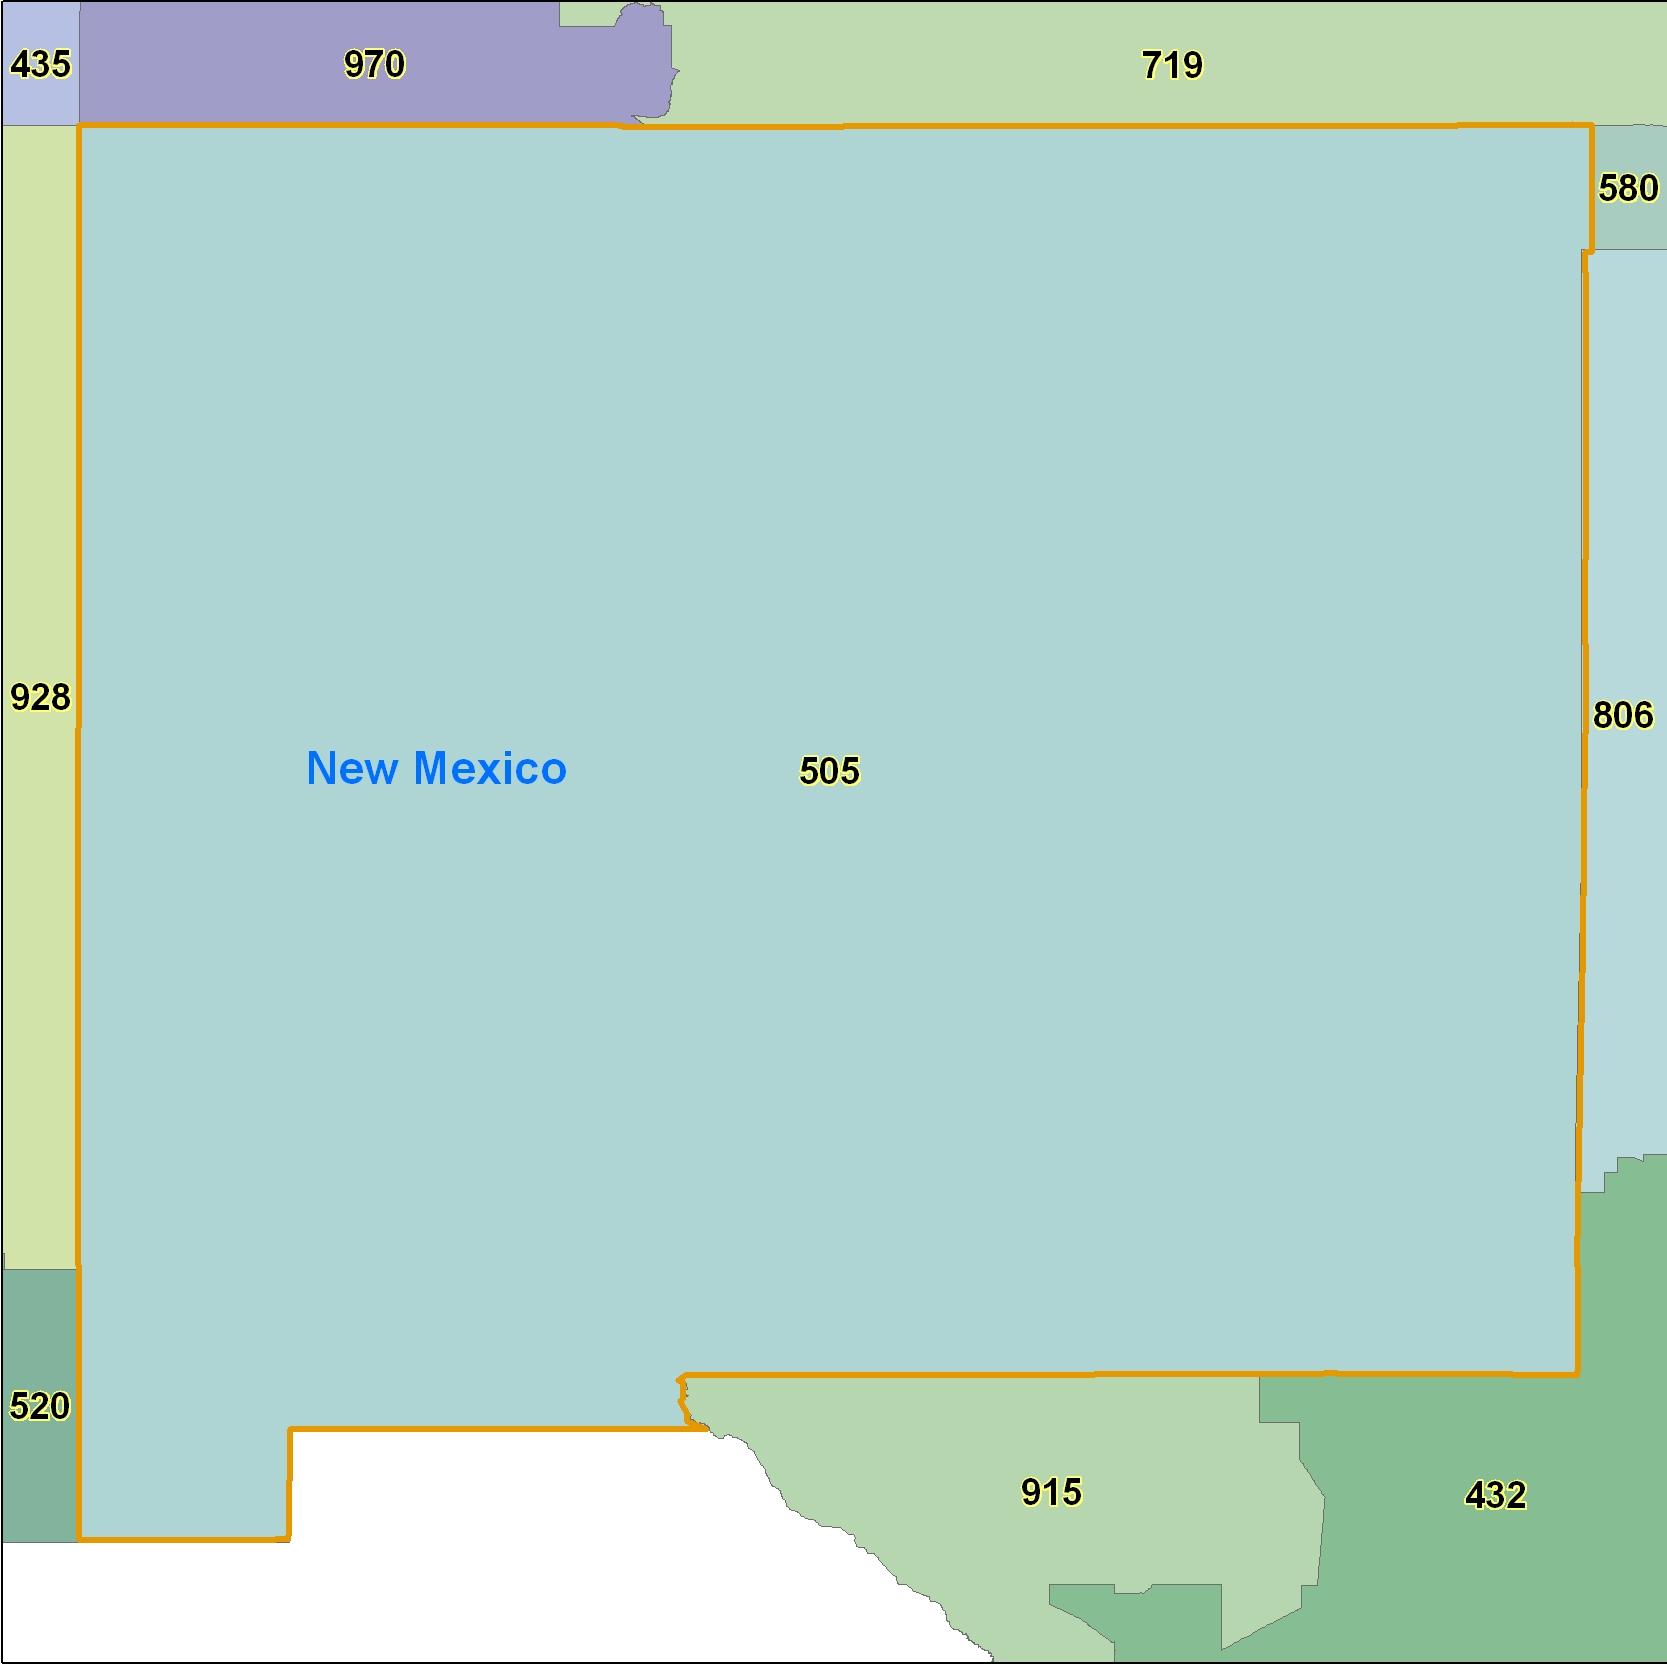 New Mexico Area Code Maps New Mexico Telephone Area Code Maps - 435 area code